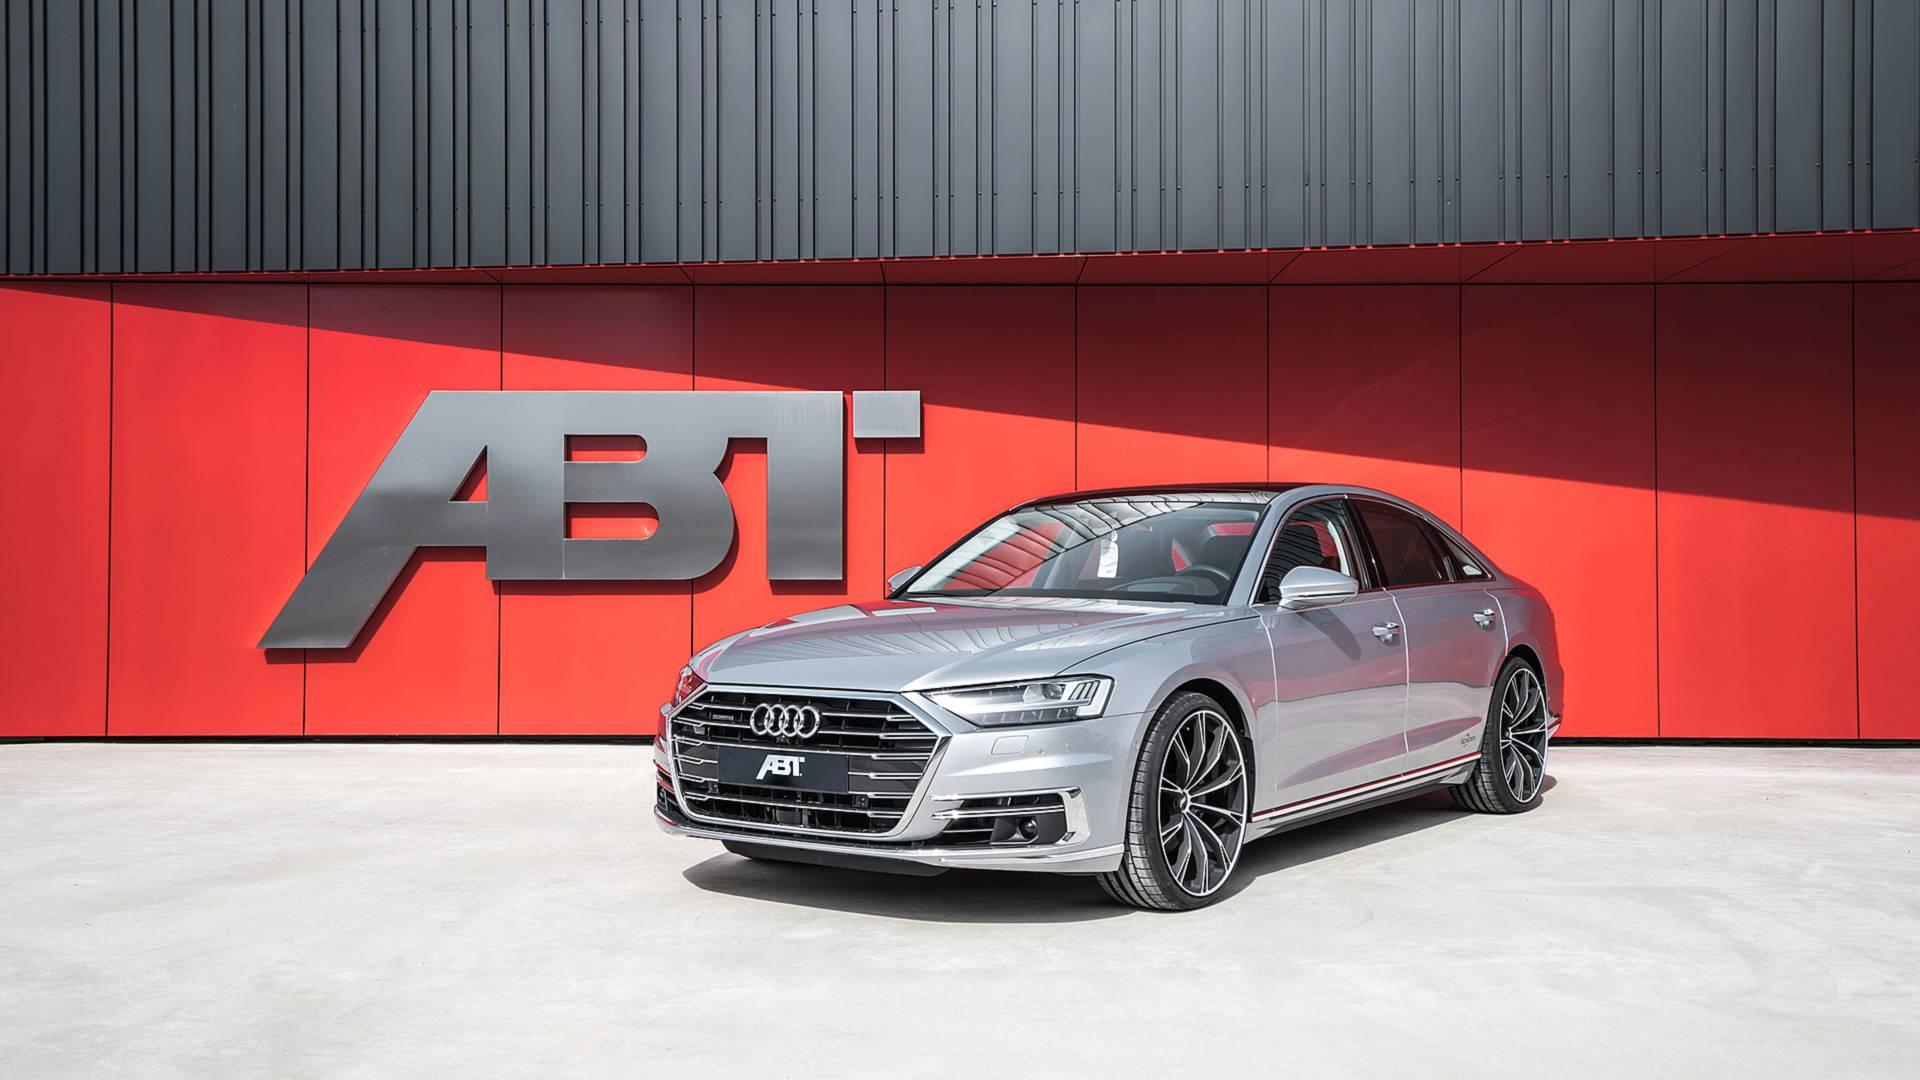 ABT desenvolve Audi A8 TDI com 330 cv